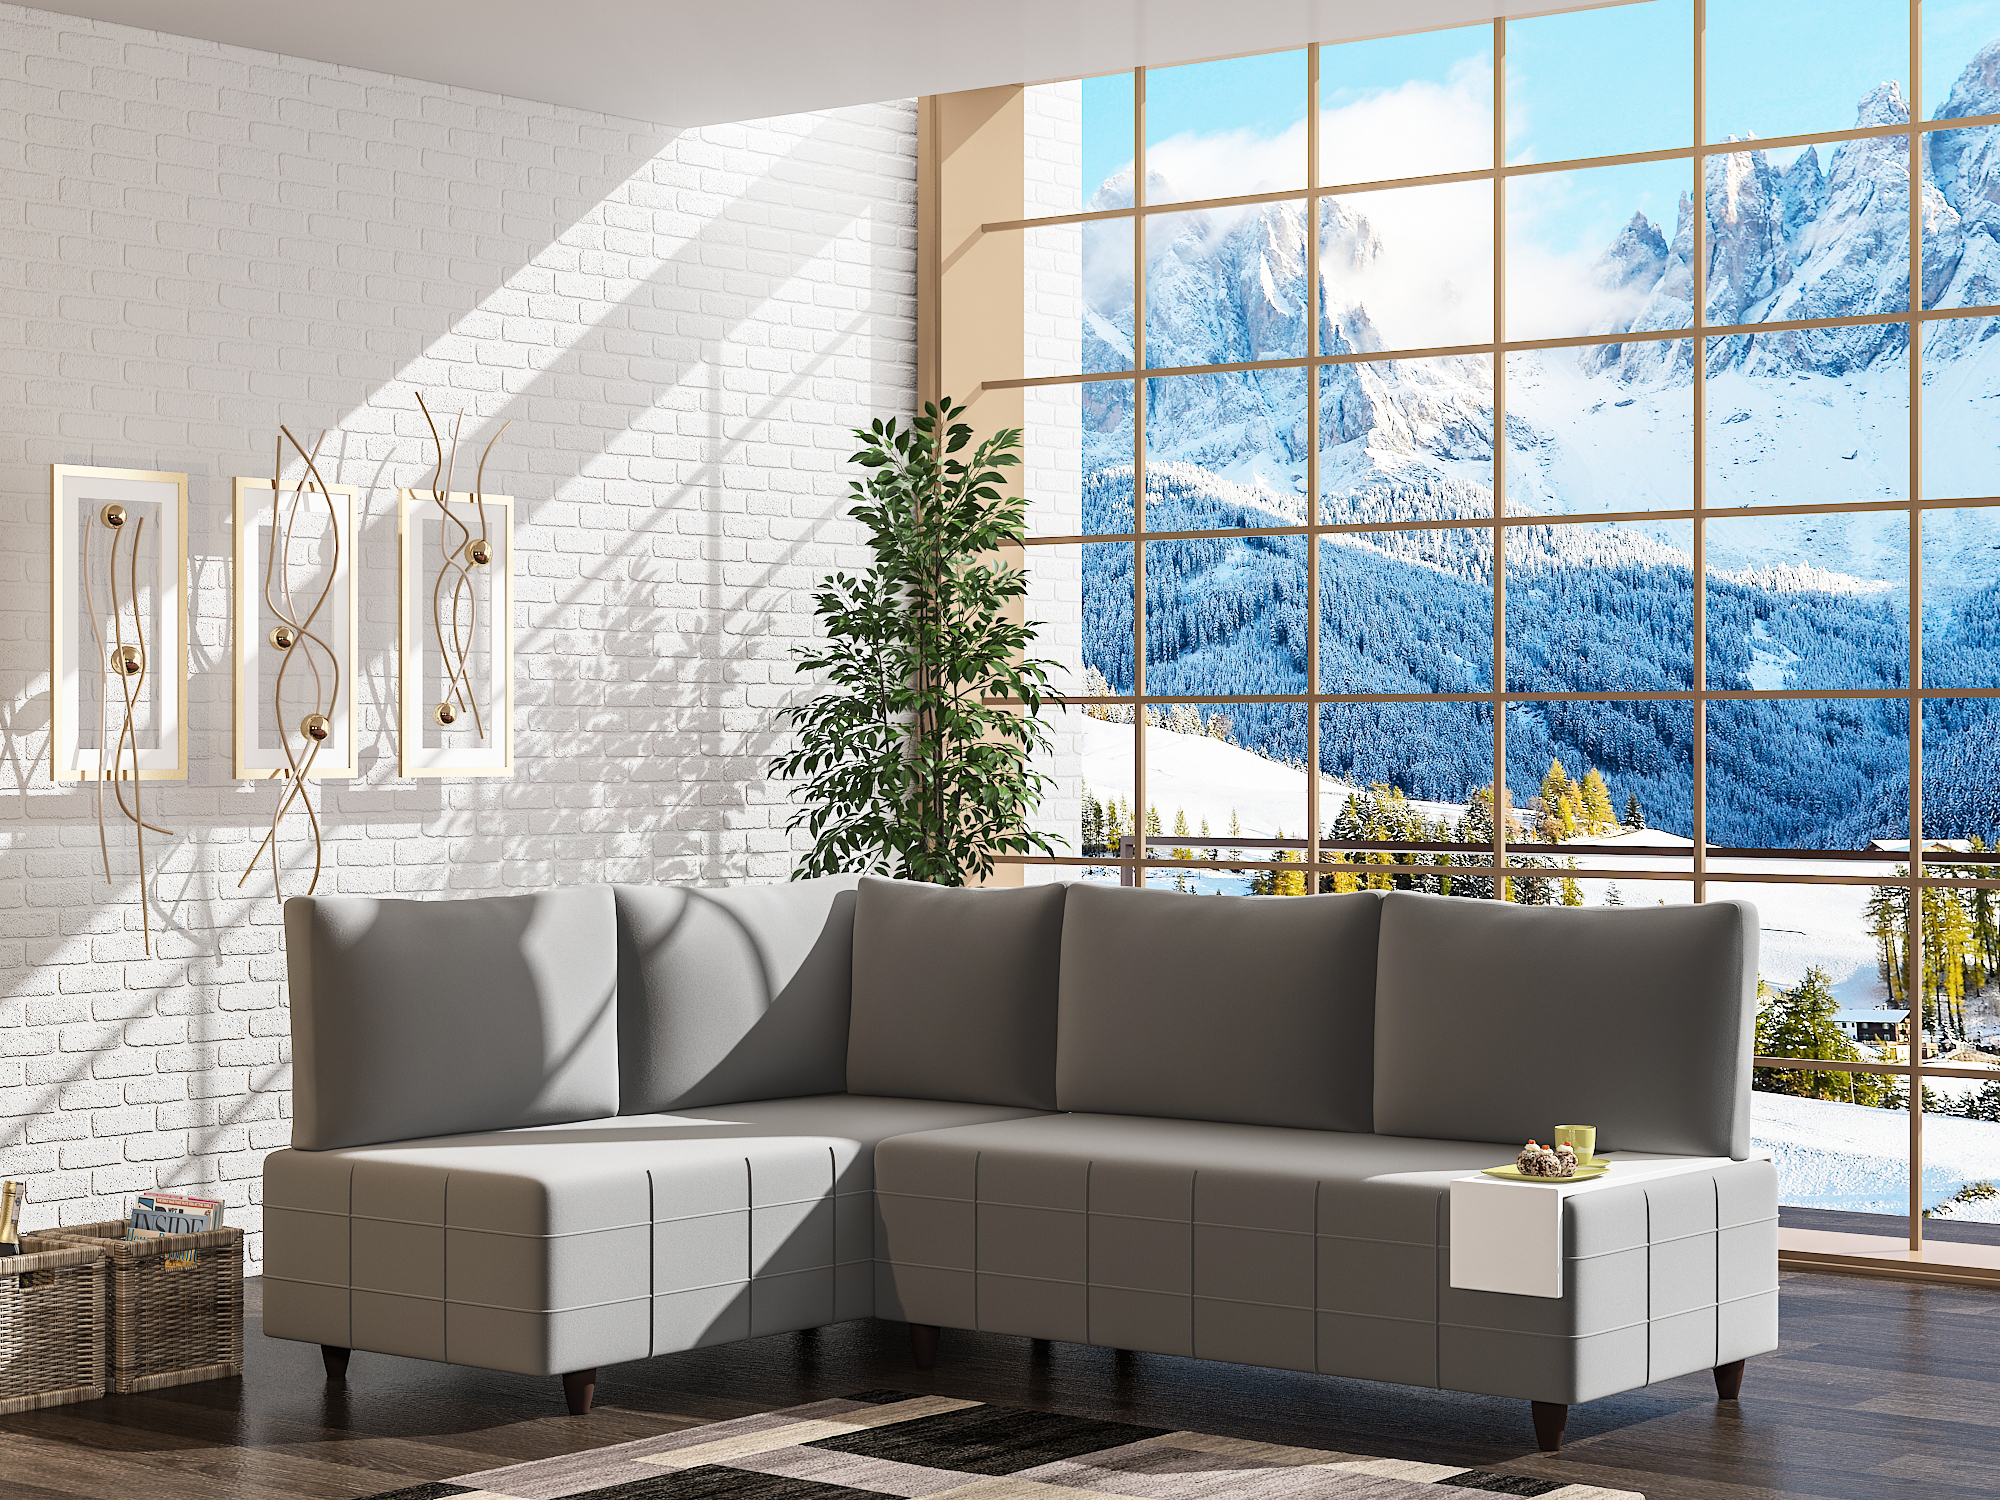 Asude Corner Sofa Set